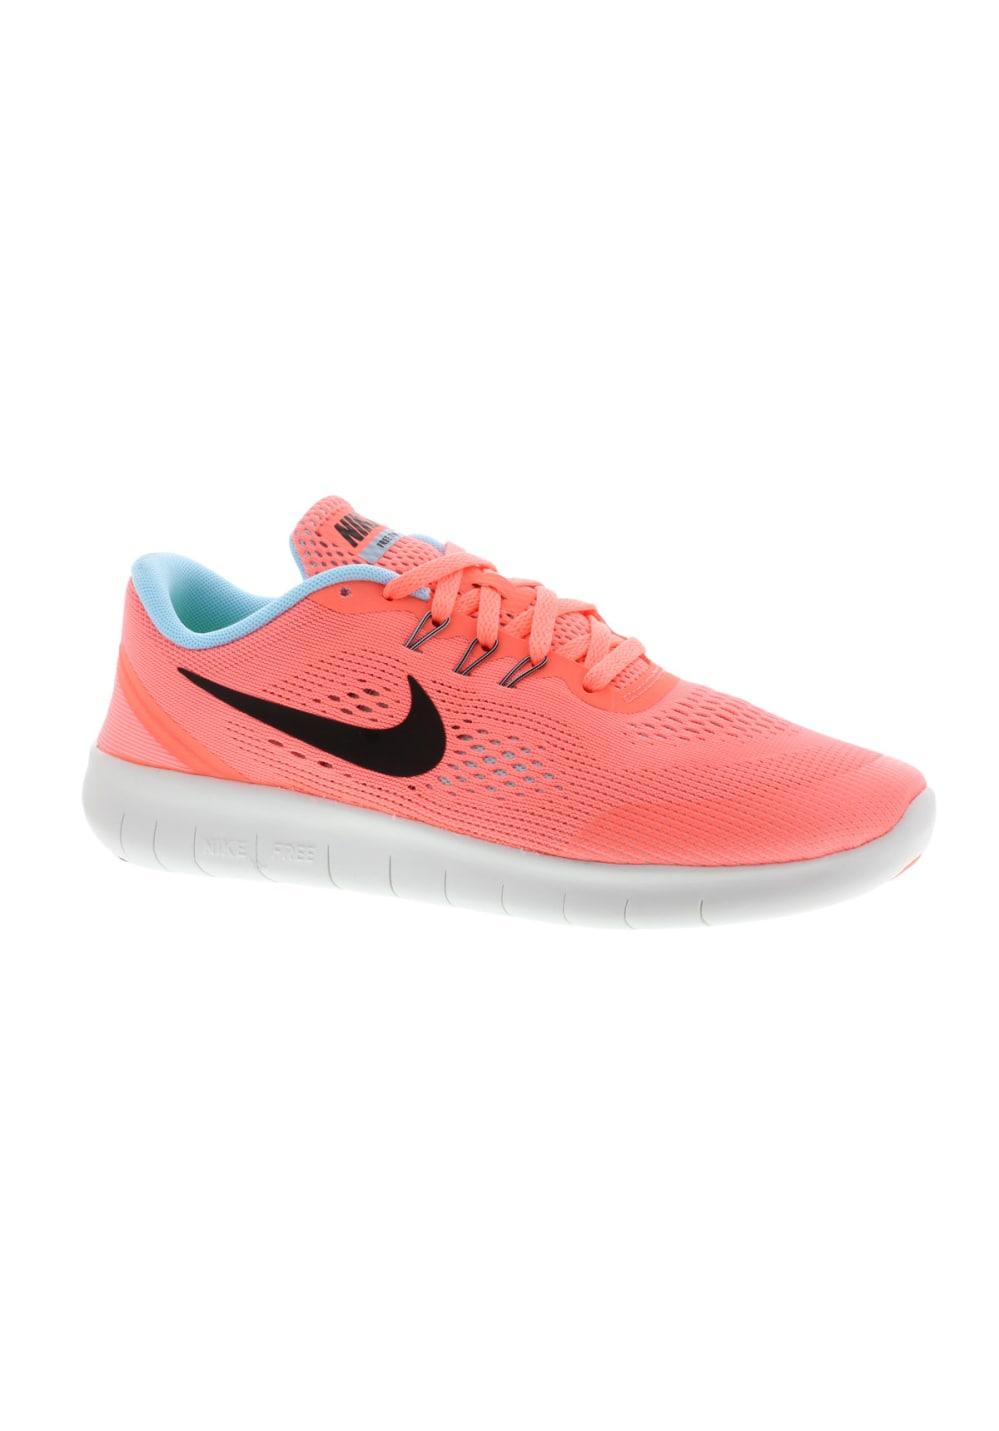 790cc70d2872 Nike Free RN GS Girls - Laufschuhe - Pink